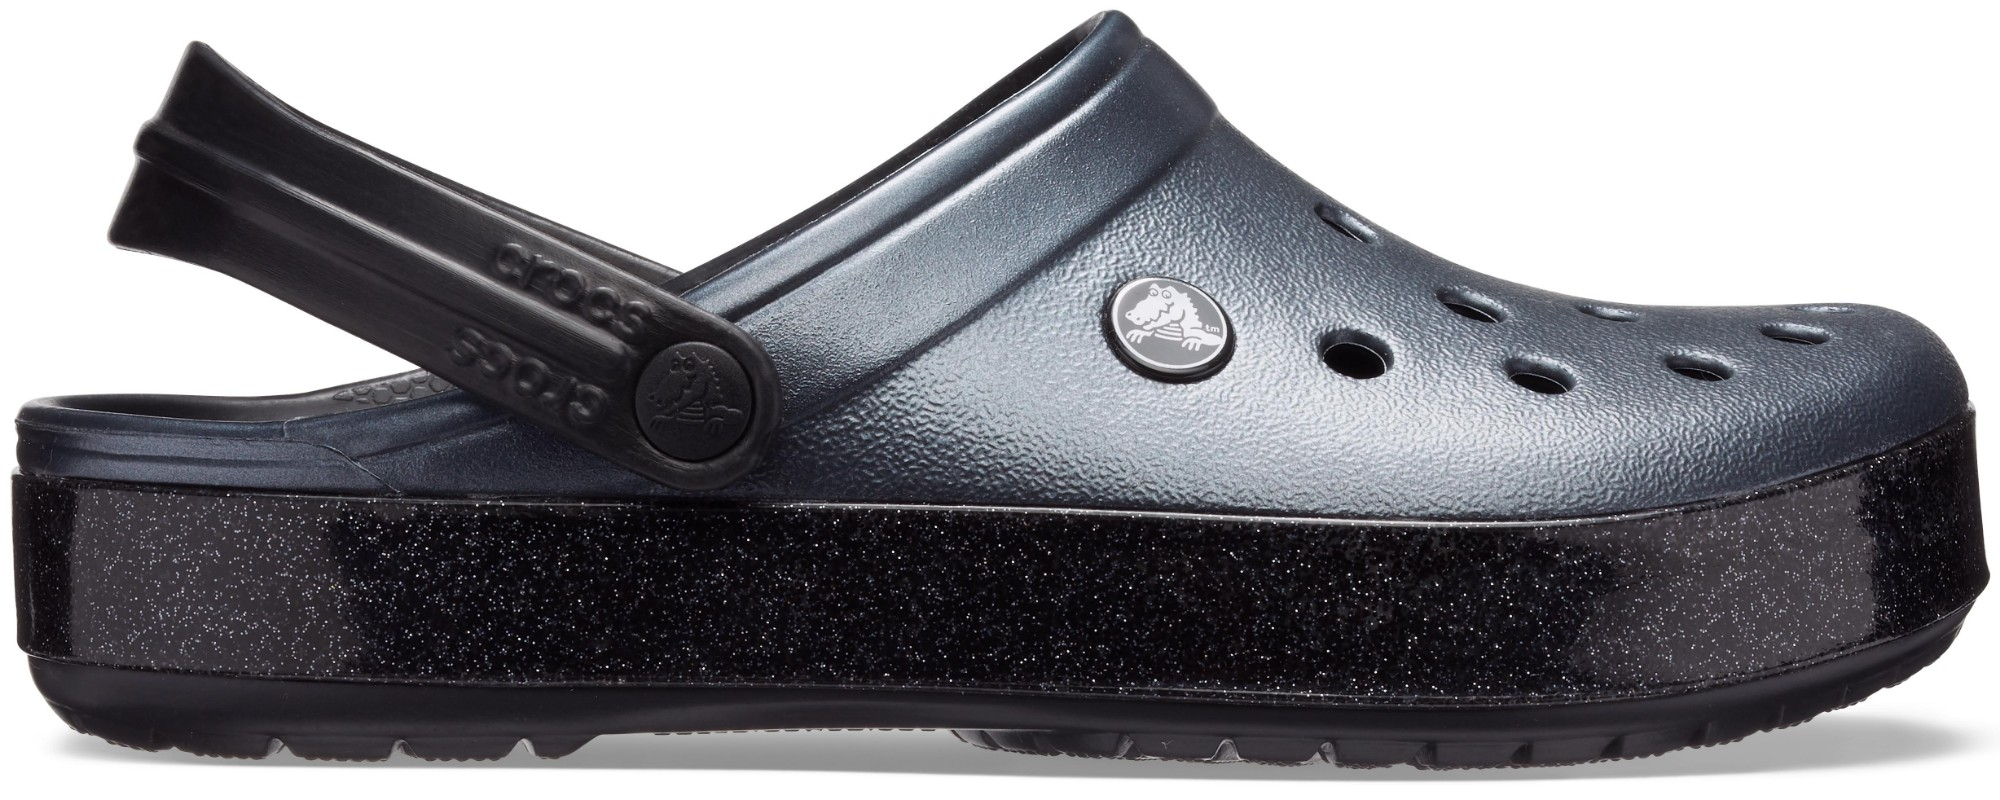 Crocs™ Crocband Printed Clog Metallic Black 42,5